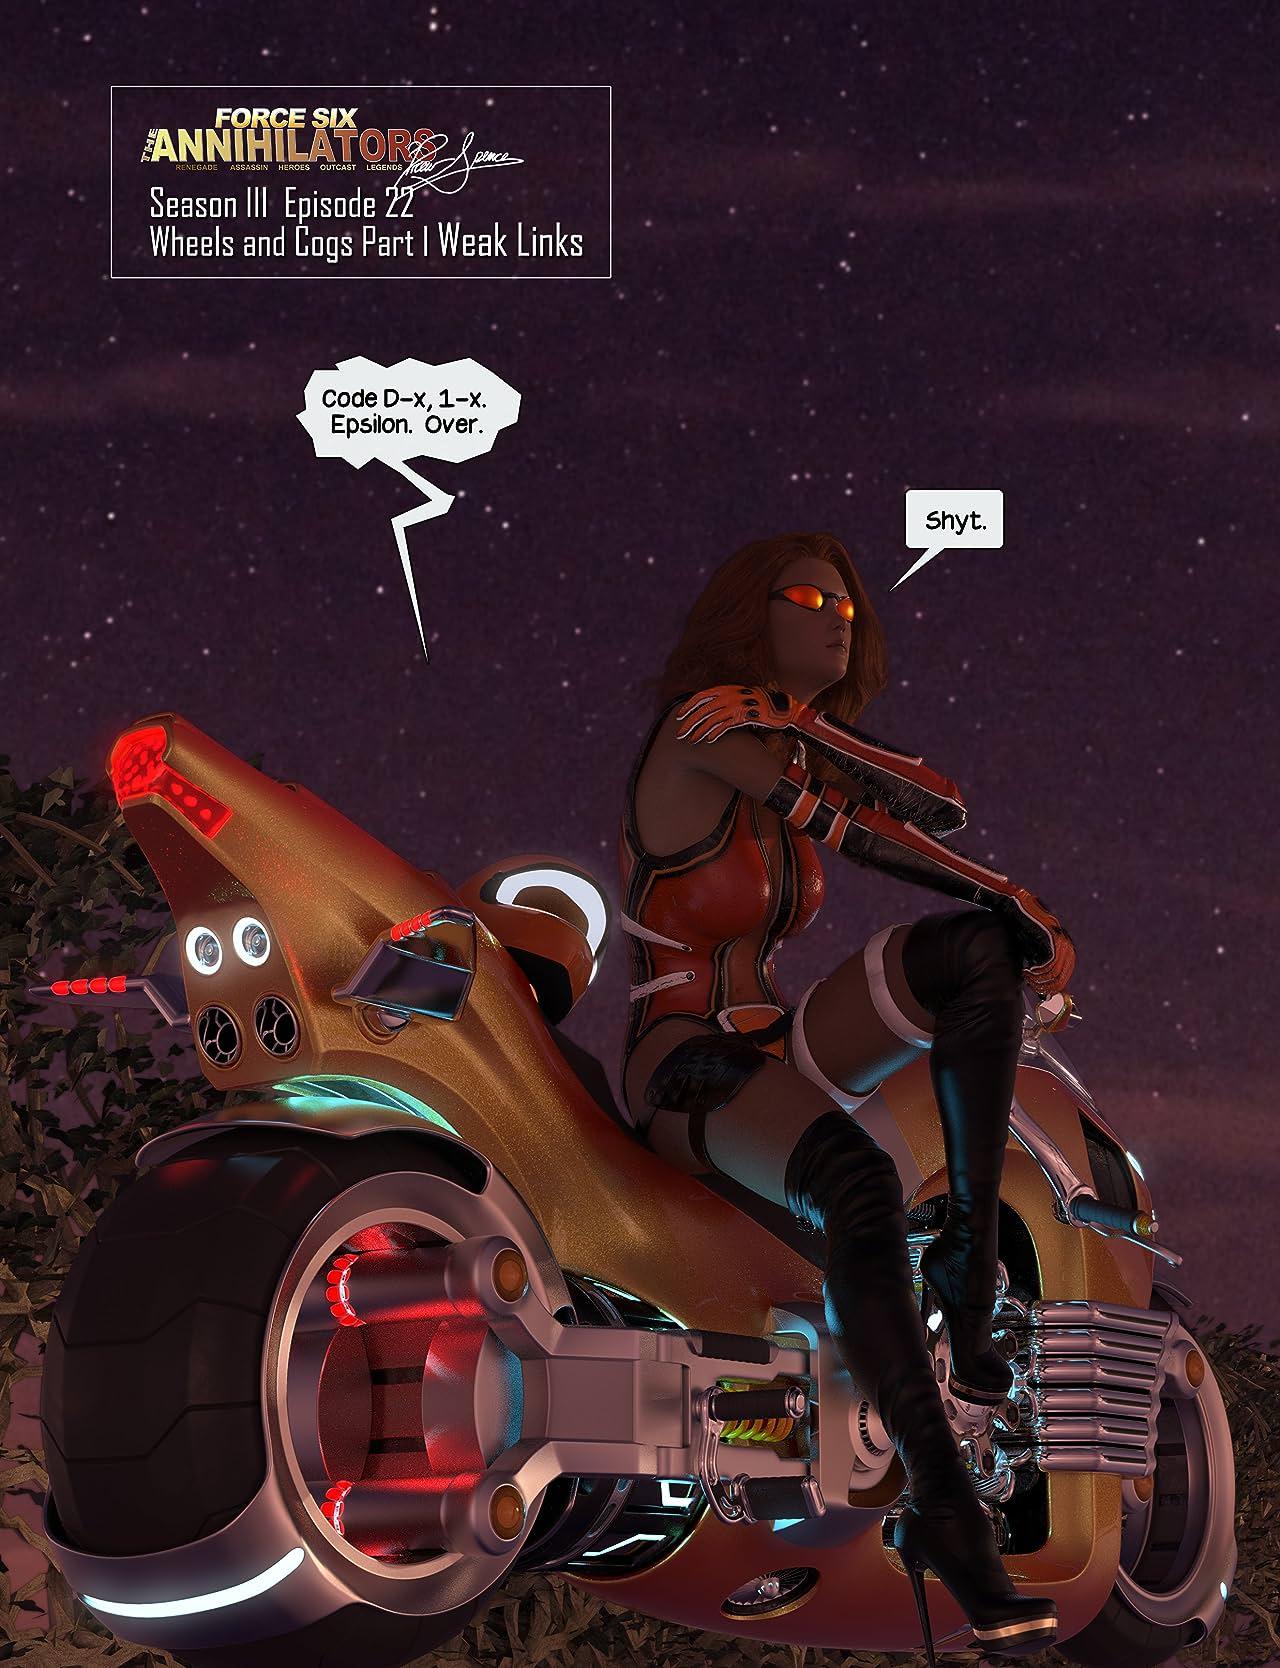 Force Six, The Annihilators #22: Wheels and Cogs: Weak Links